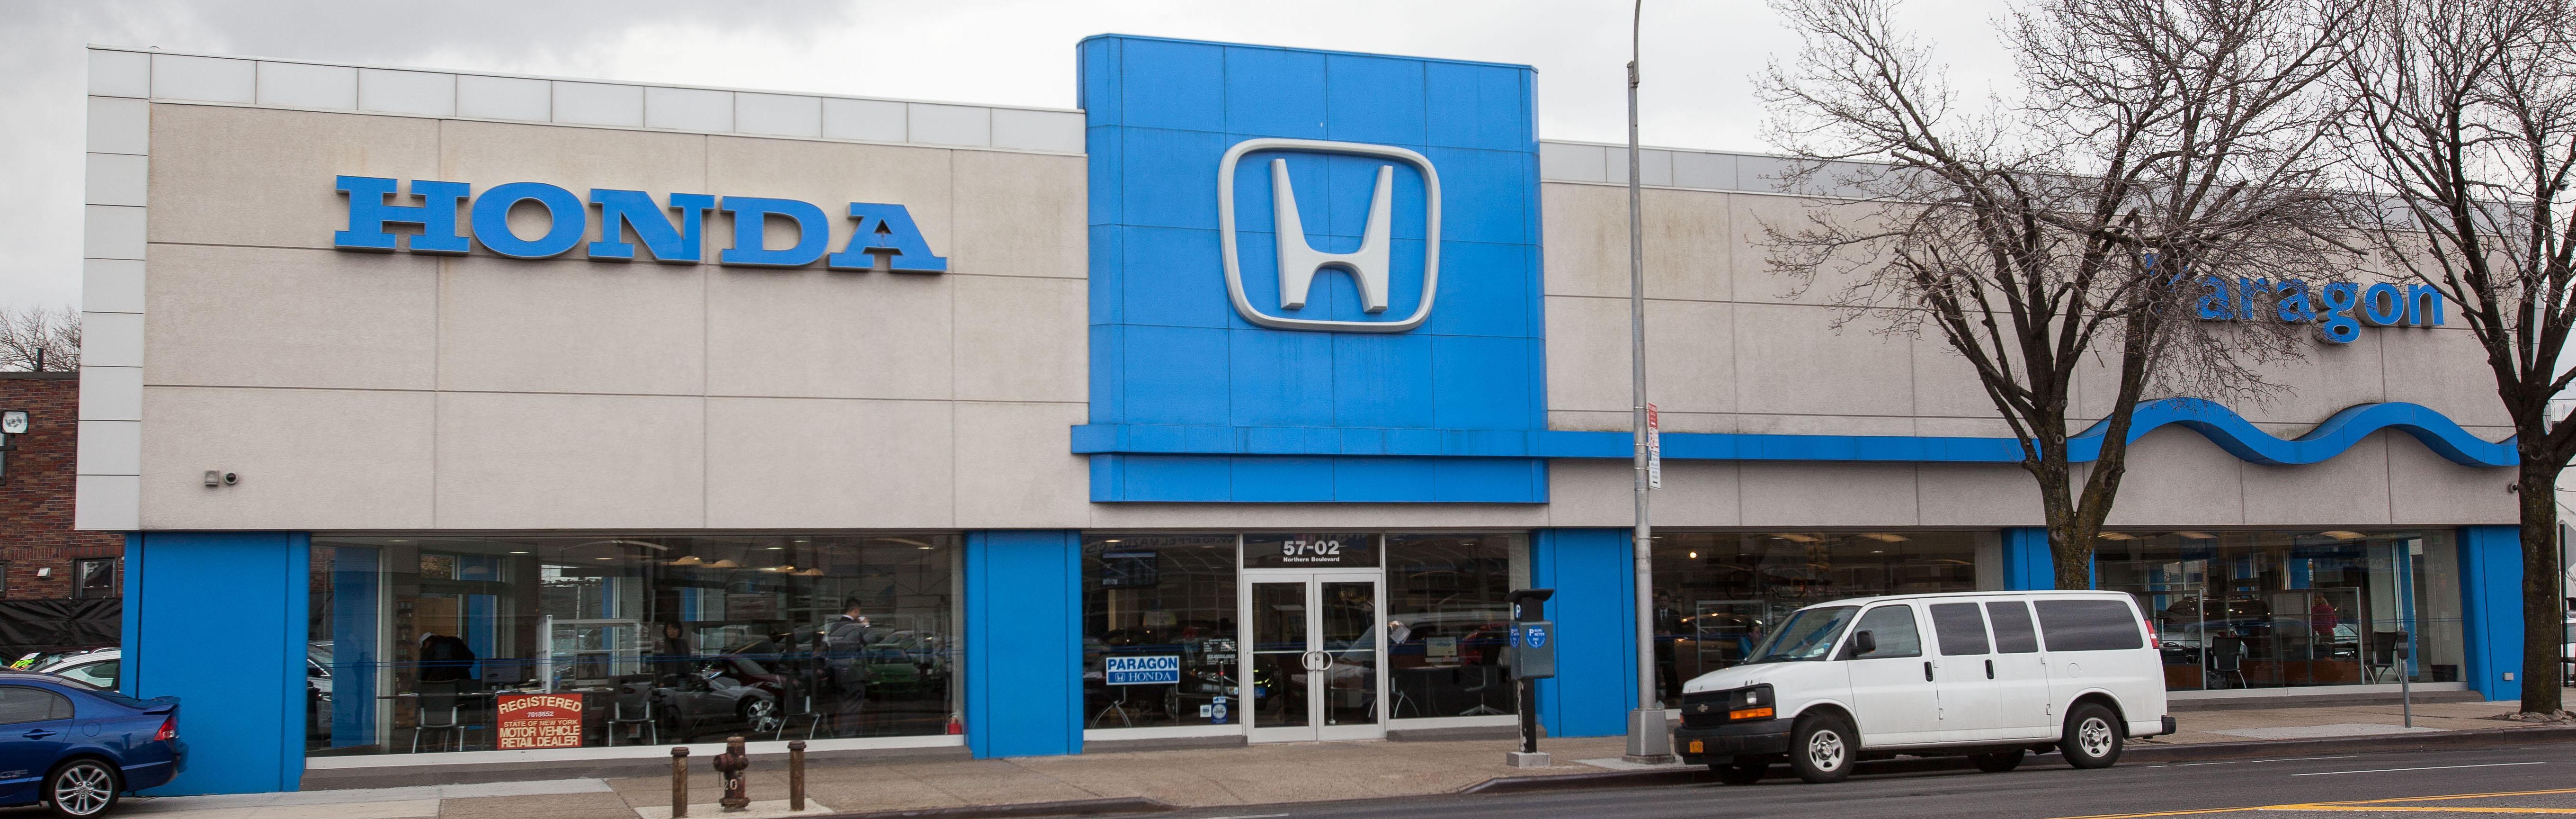 Paragon Honda   AutomotoHR